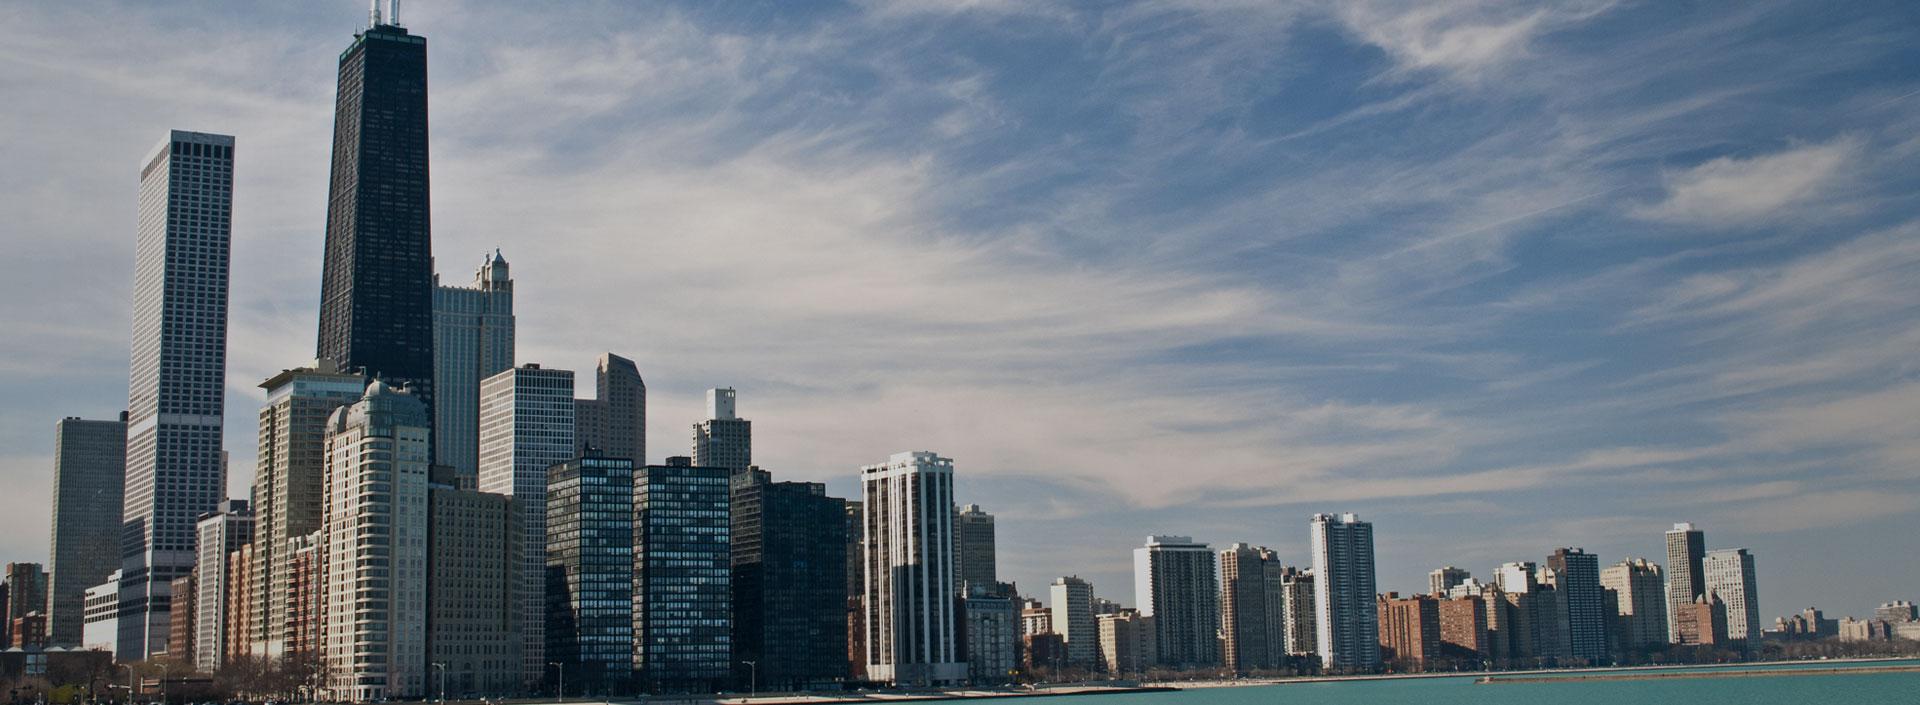 04-Chicago1